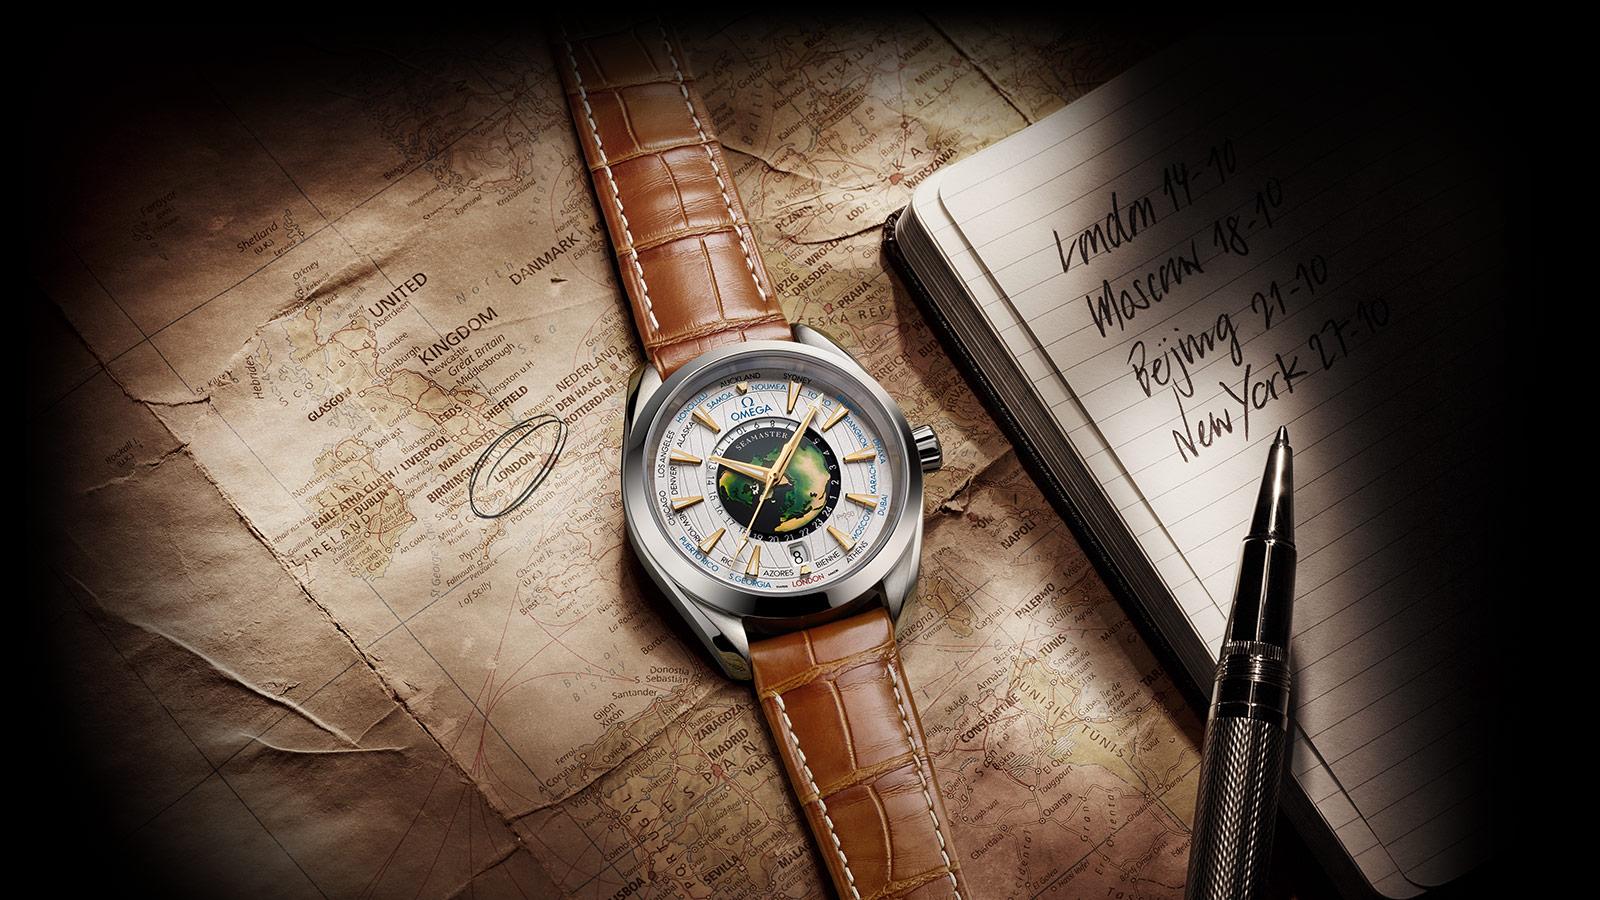 8 worldtimer watches that will take you around the globe